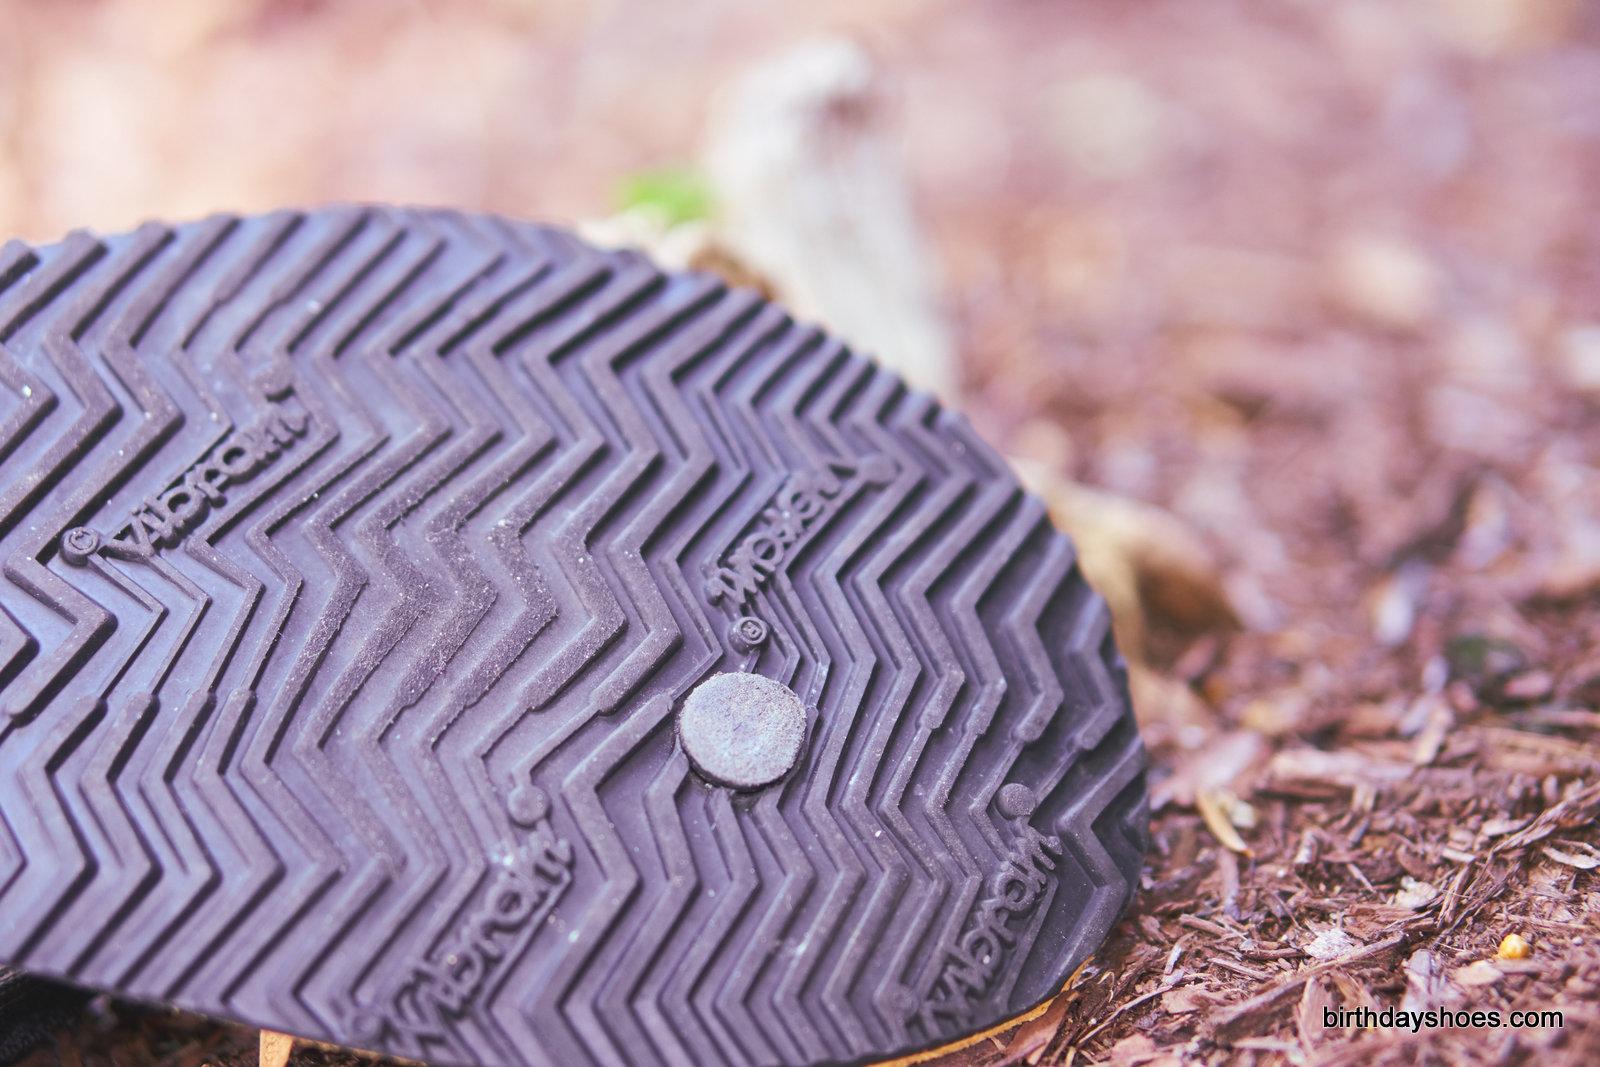 Vibram Newflex sole on the Shamma Warriors 2.0